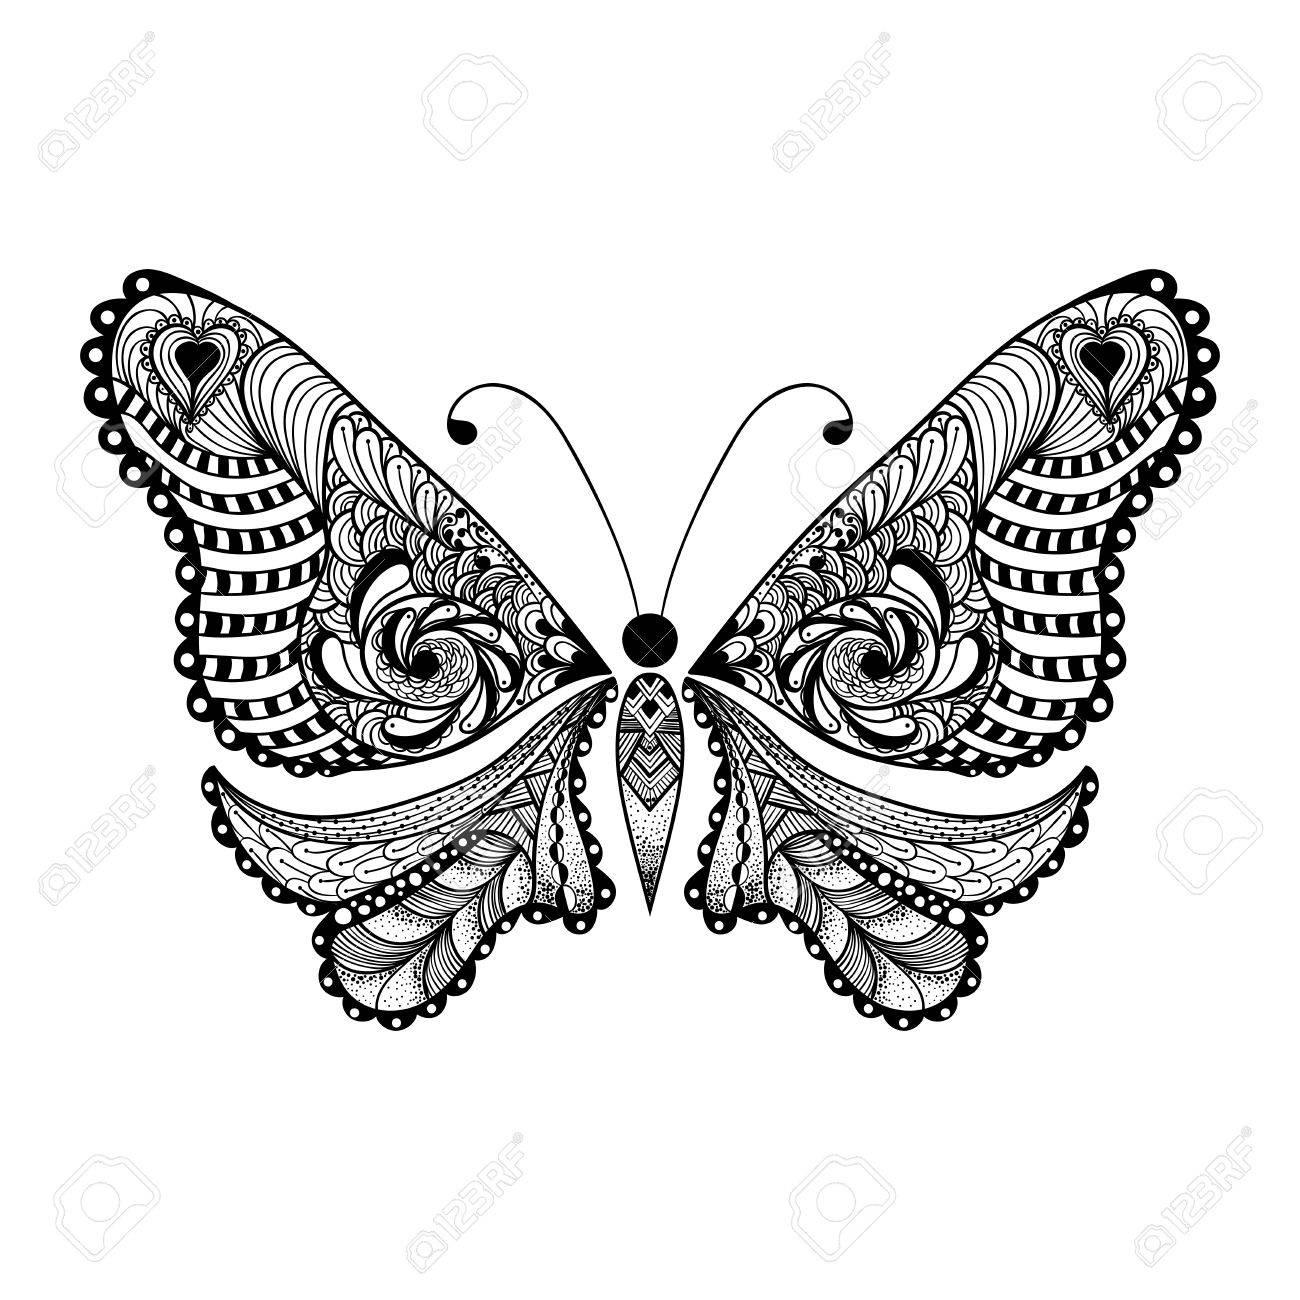 Moderno Mariposa Enmarcado Modelo - Ideas Personalizadas de Marco de ...